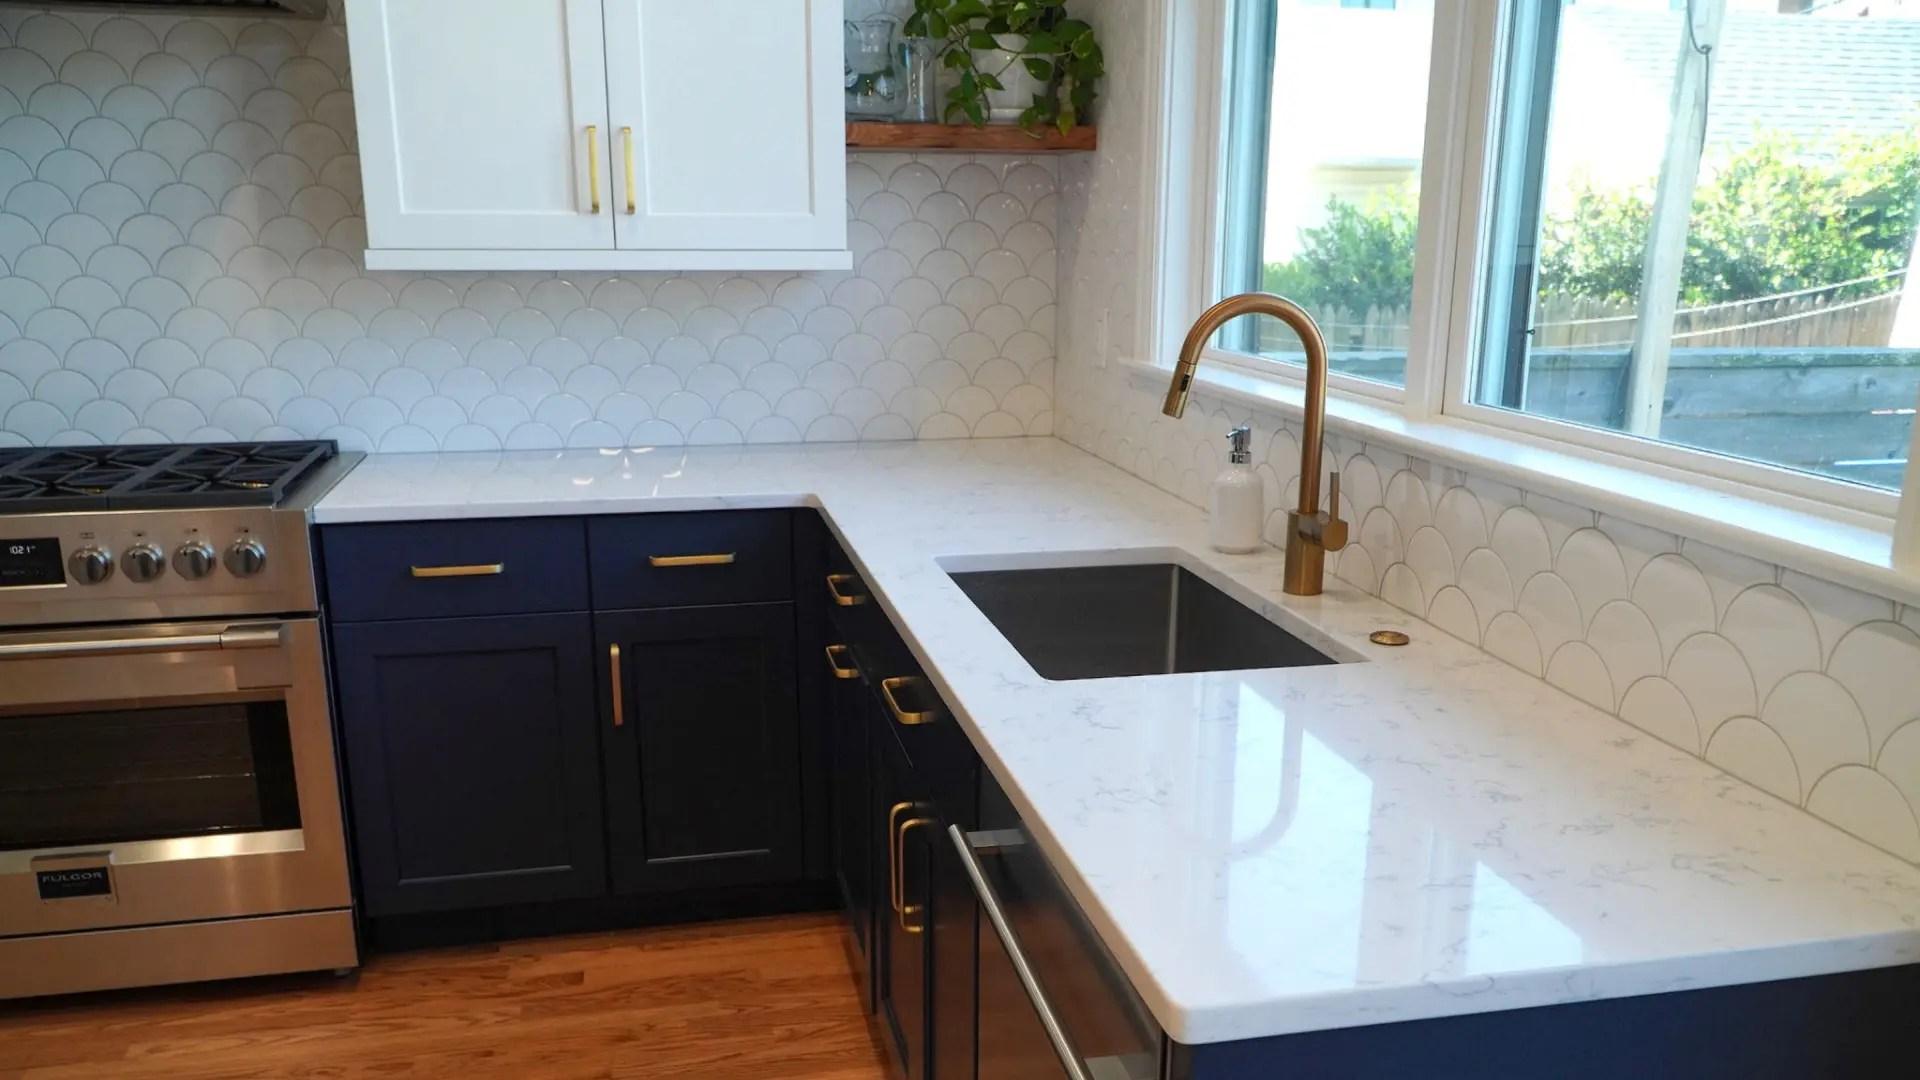 Keil-Kitchen-Fishscale-Blue-Sink